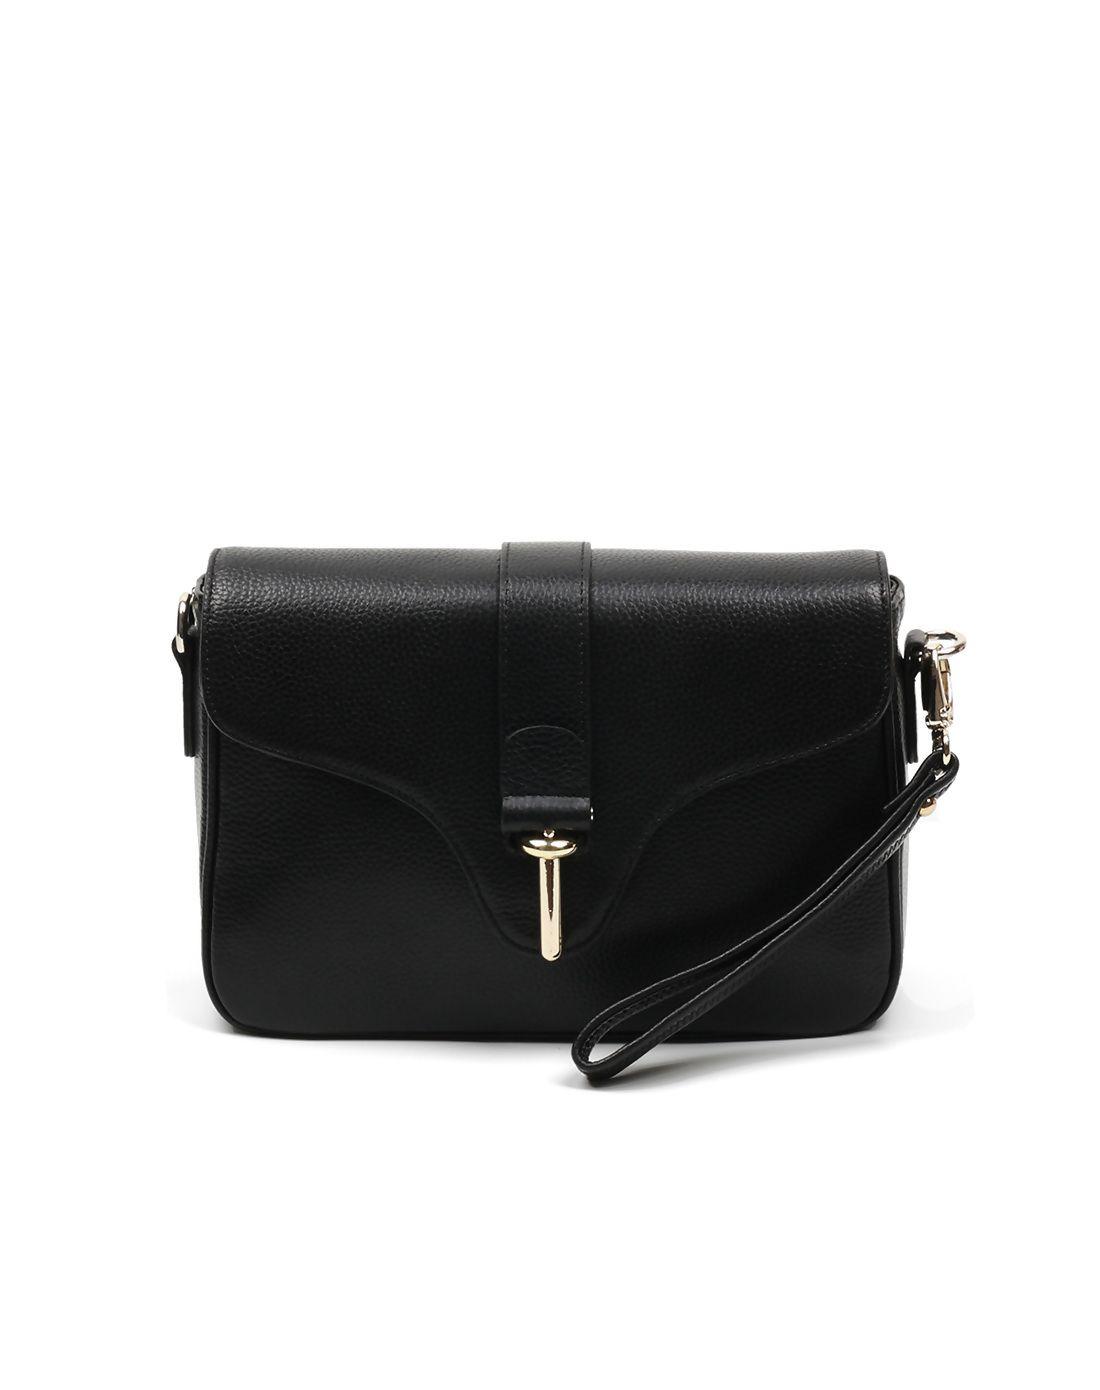 ... low cost e4913 fb5ac AdoreWe VIPme Shoulder Bags - agebel Black Elegant  Leather Shoulder Bag -  buy online d2e3e 179ec AdoreWe StyleWe Womens -  QIANBH ... d228f03427969